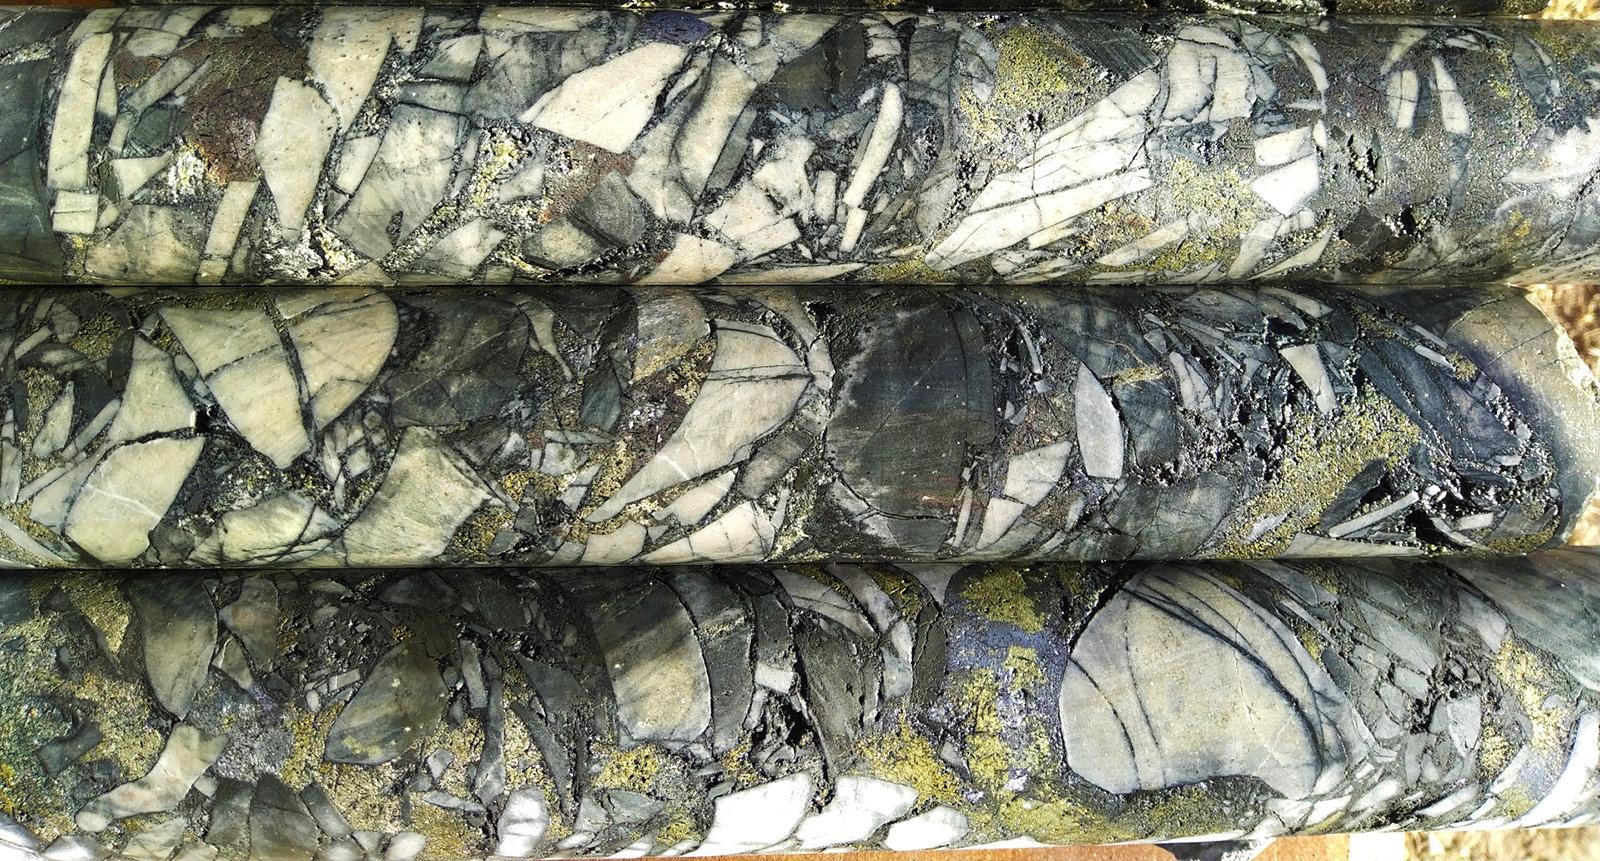 Typical gold-silver-copper-lead-zinc breccia mineralisation: sericite-silica-tourmaline altered clasts of quartzite and siltstone set in a chalcopyrite-pyrite-sphalerite-quartz-tourmaline matrix.